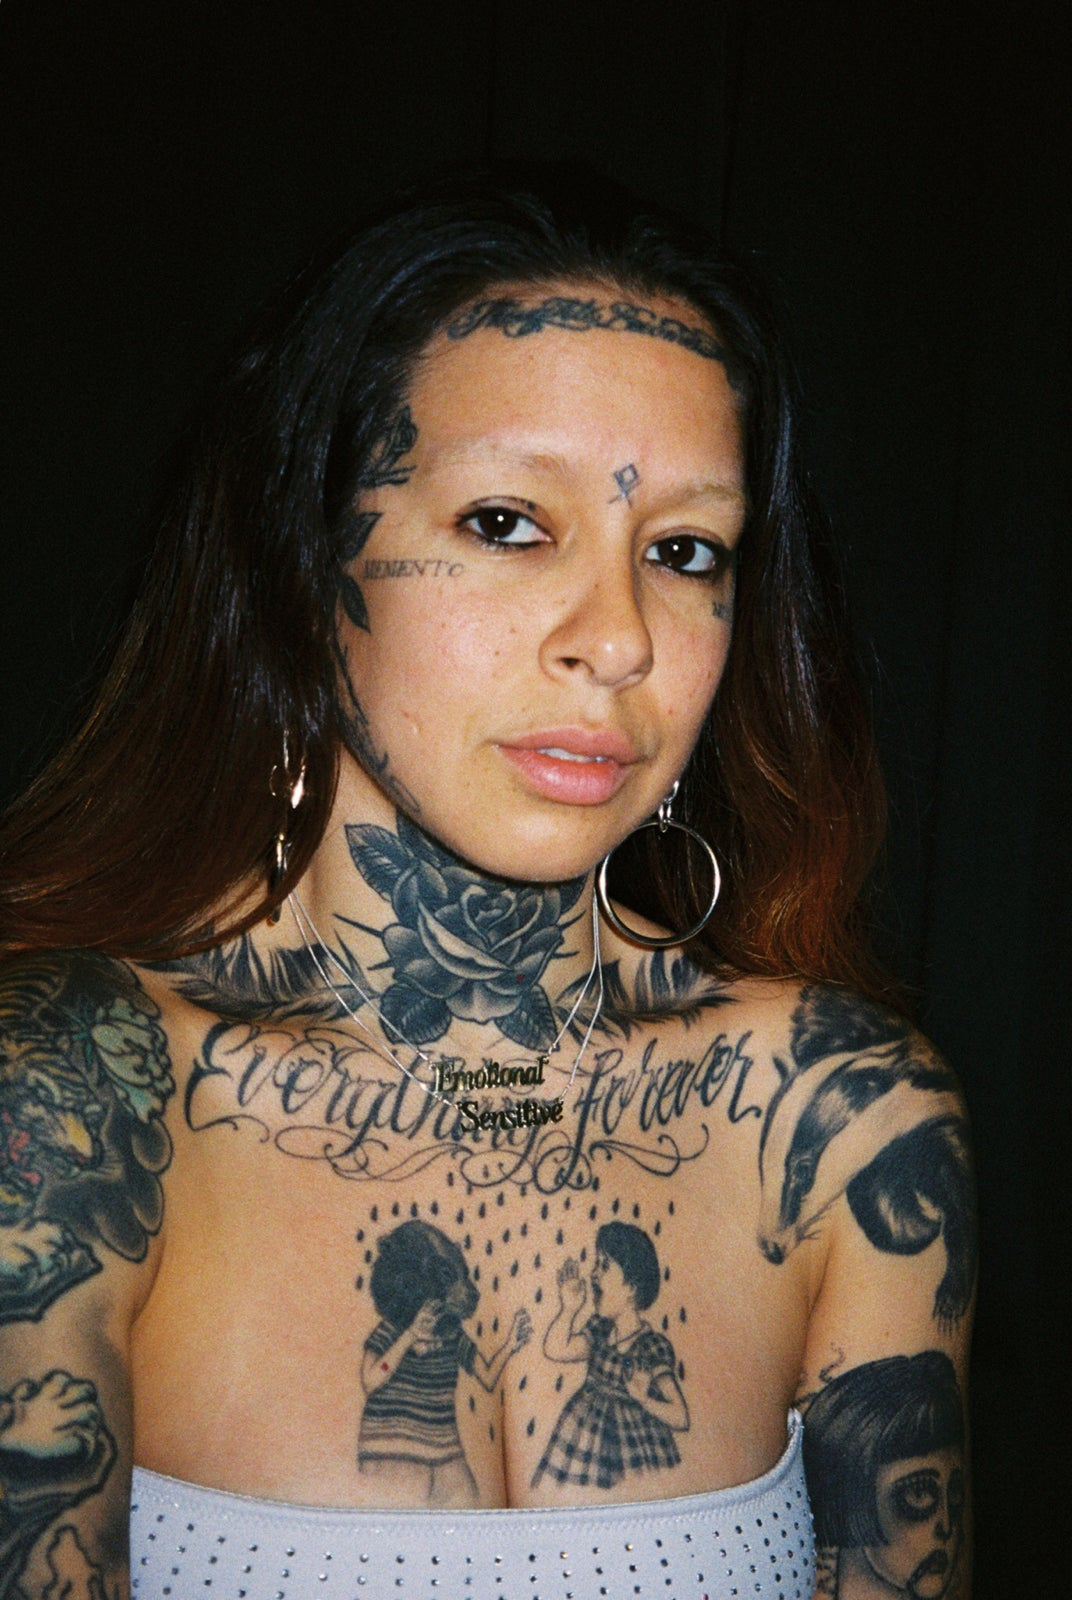 Image of Emotional necklace